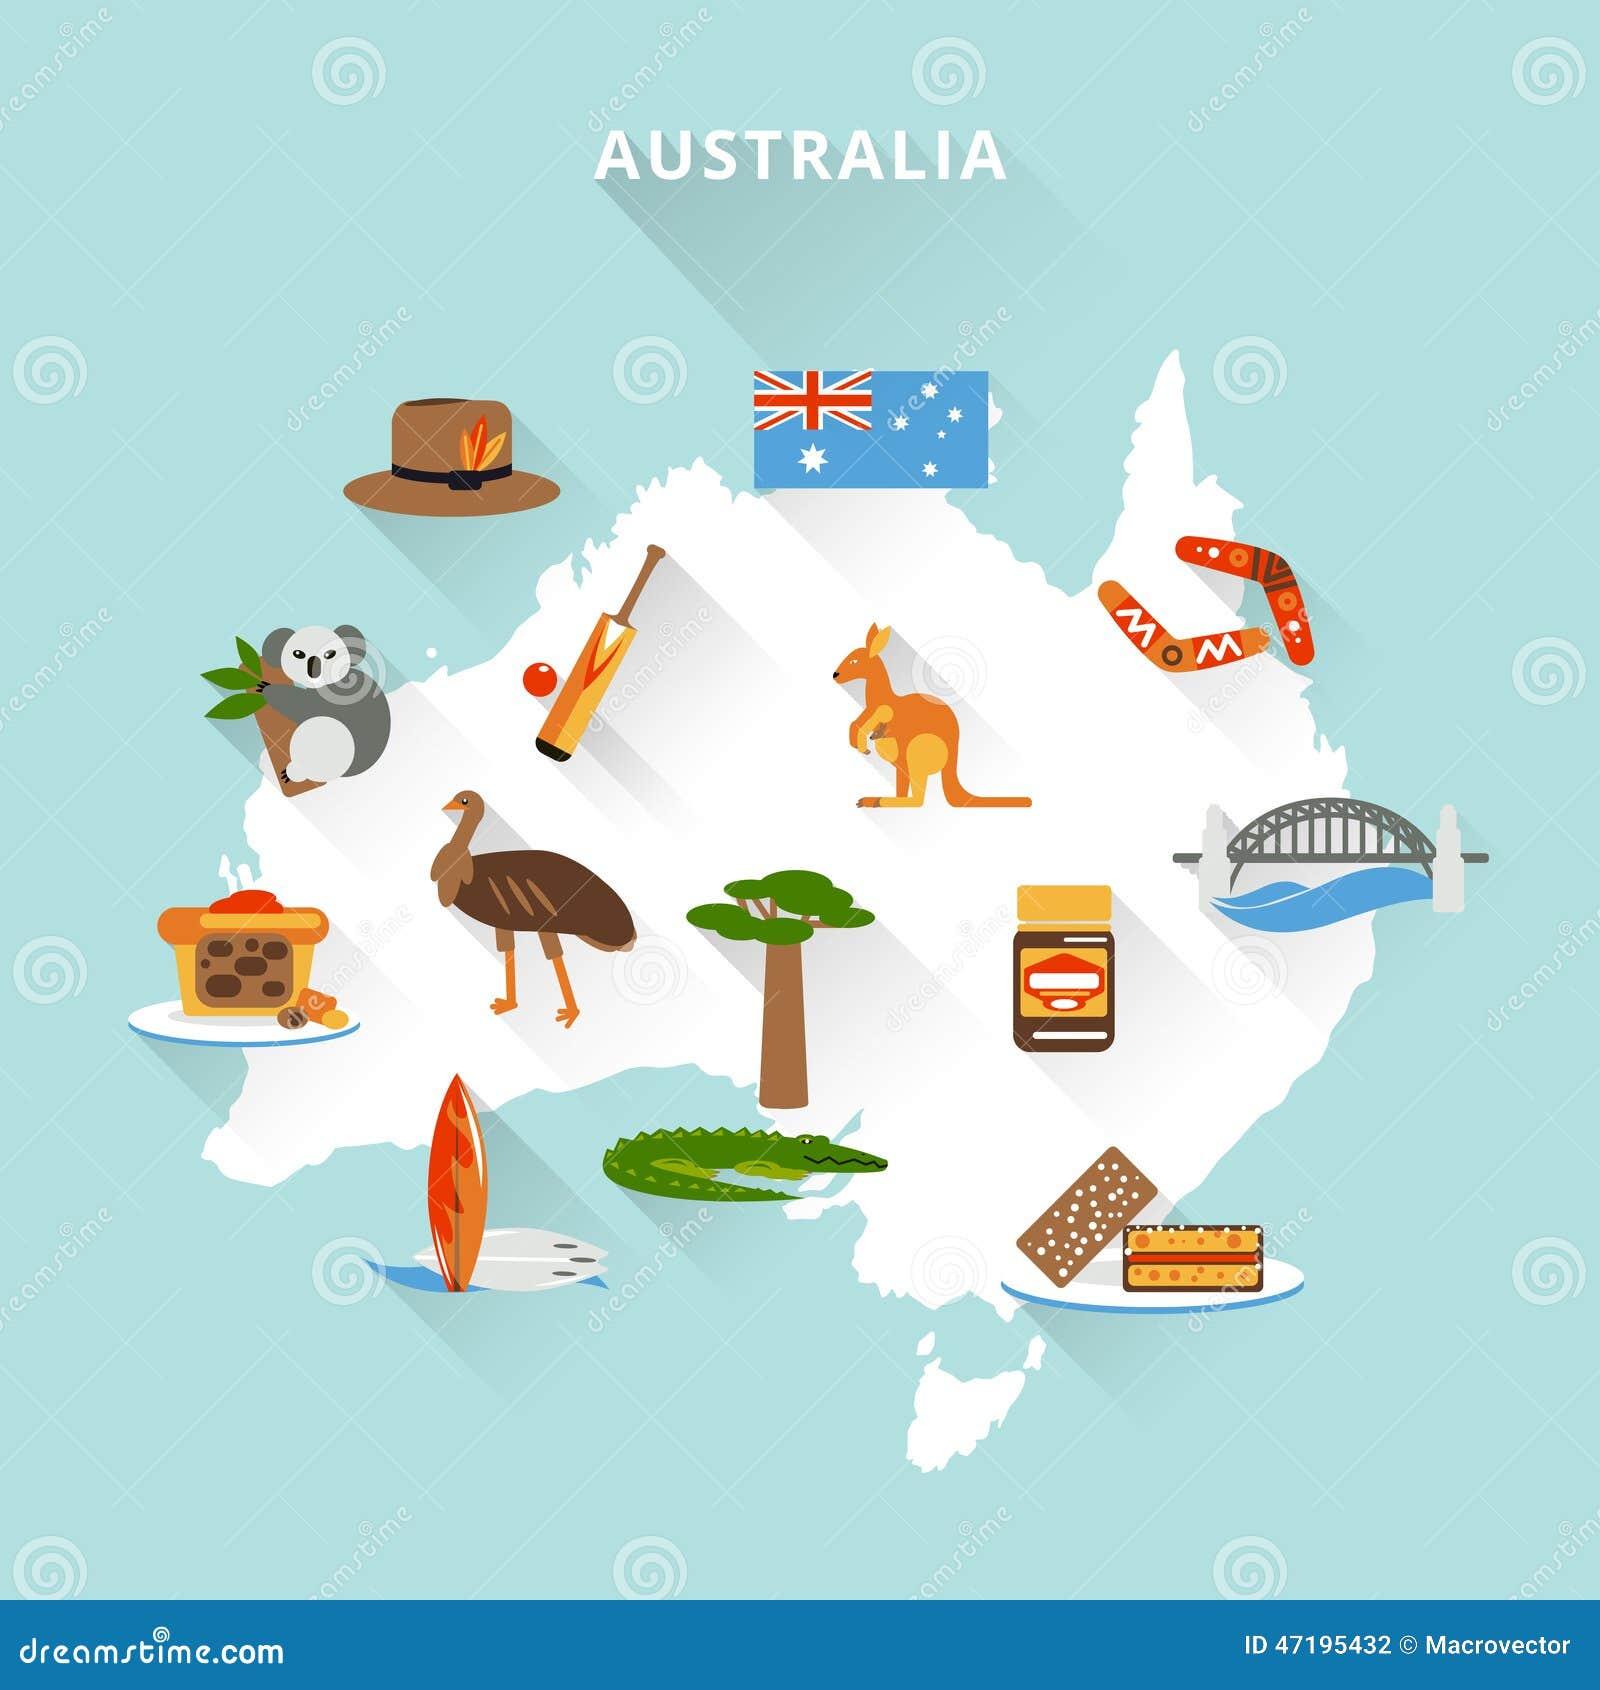 Australia Tourist Map Vector Image 47195432 – Travel Map of Australia